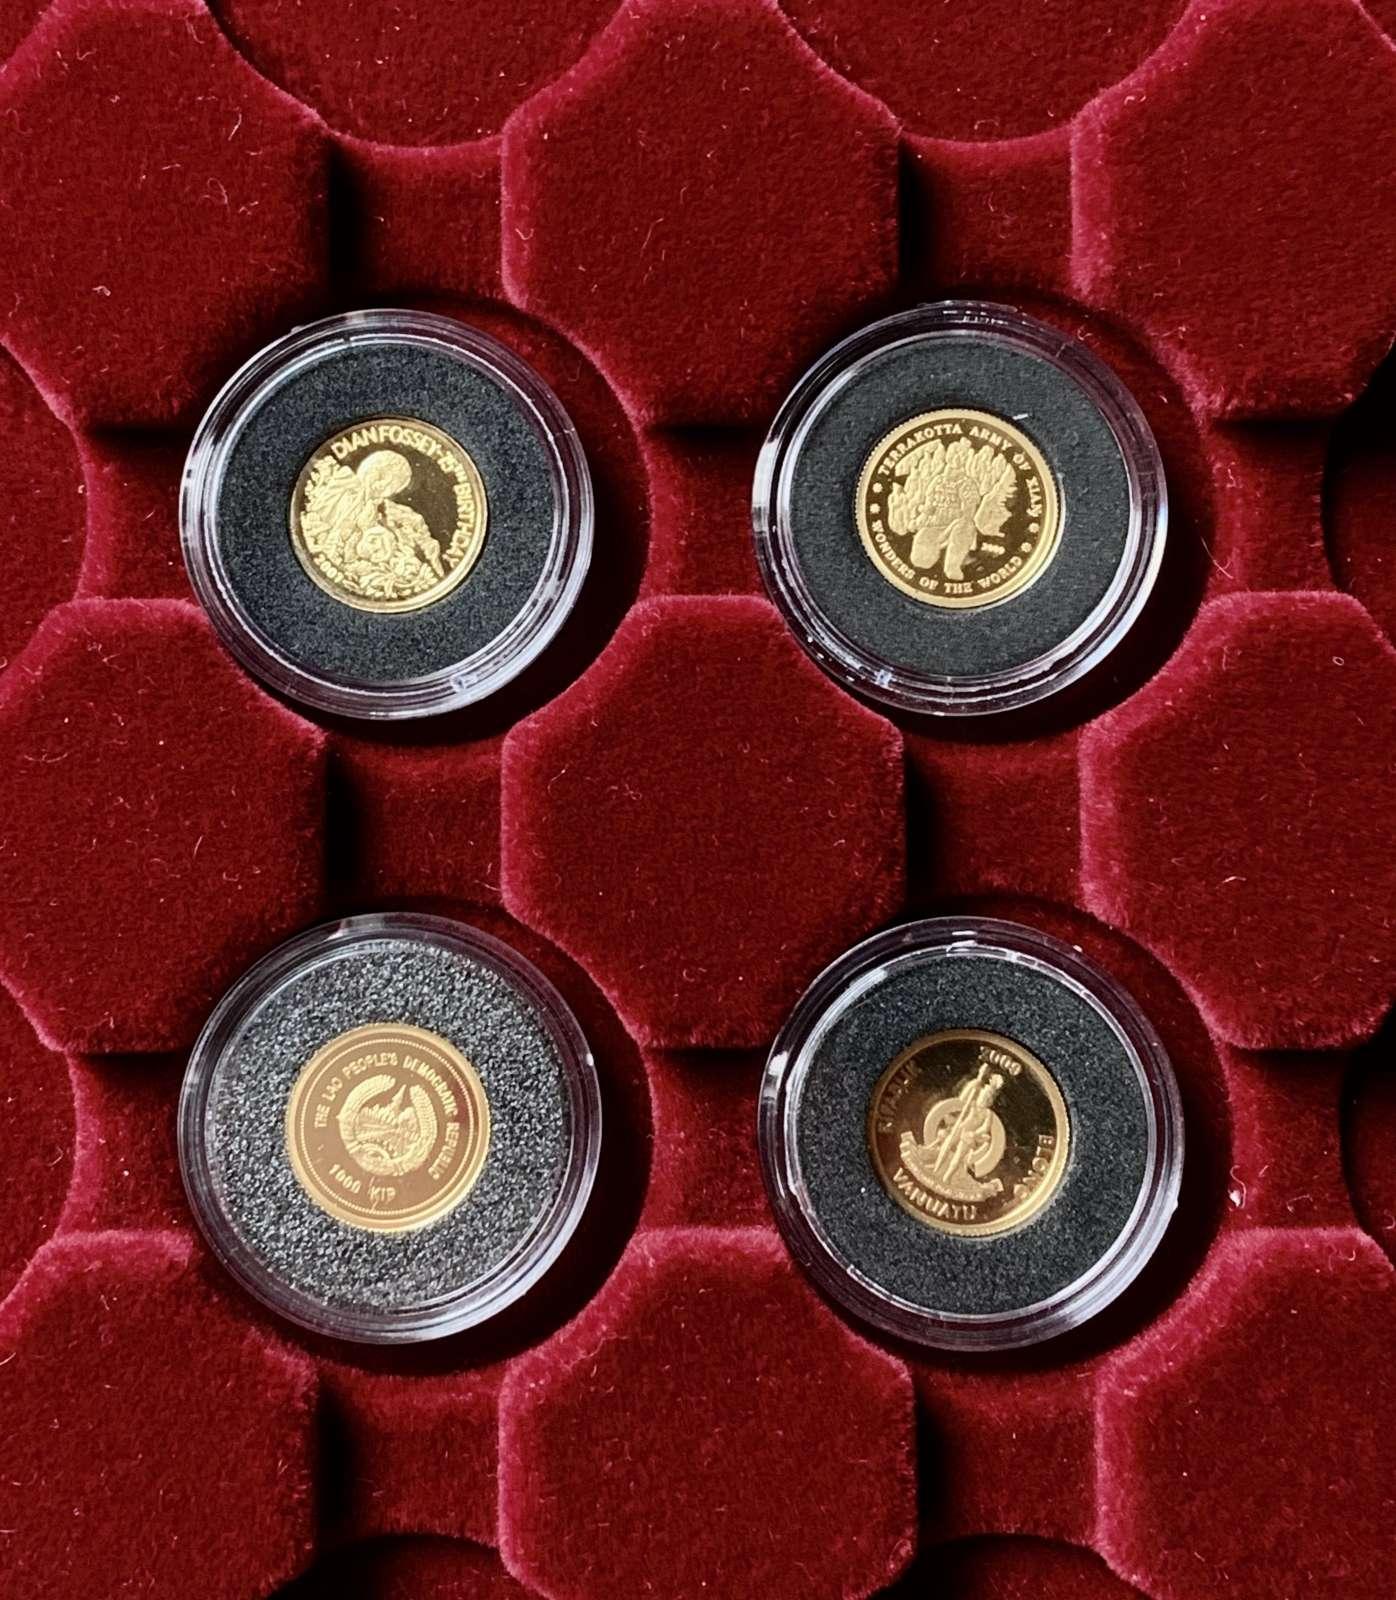 Monety złote 4 sztuki